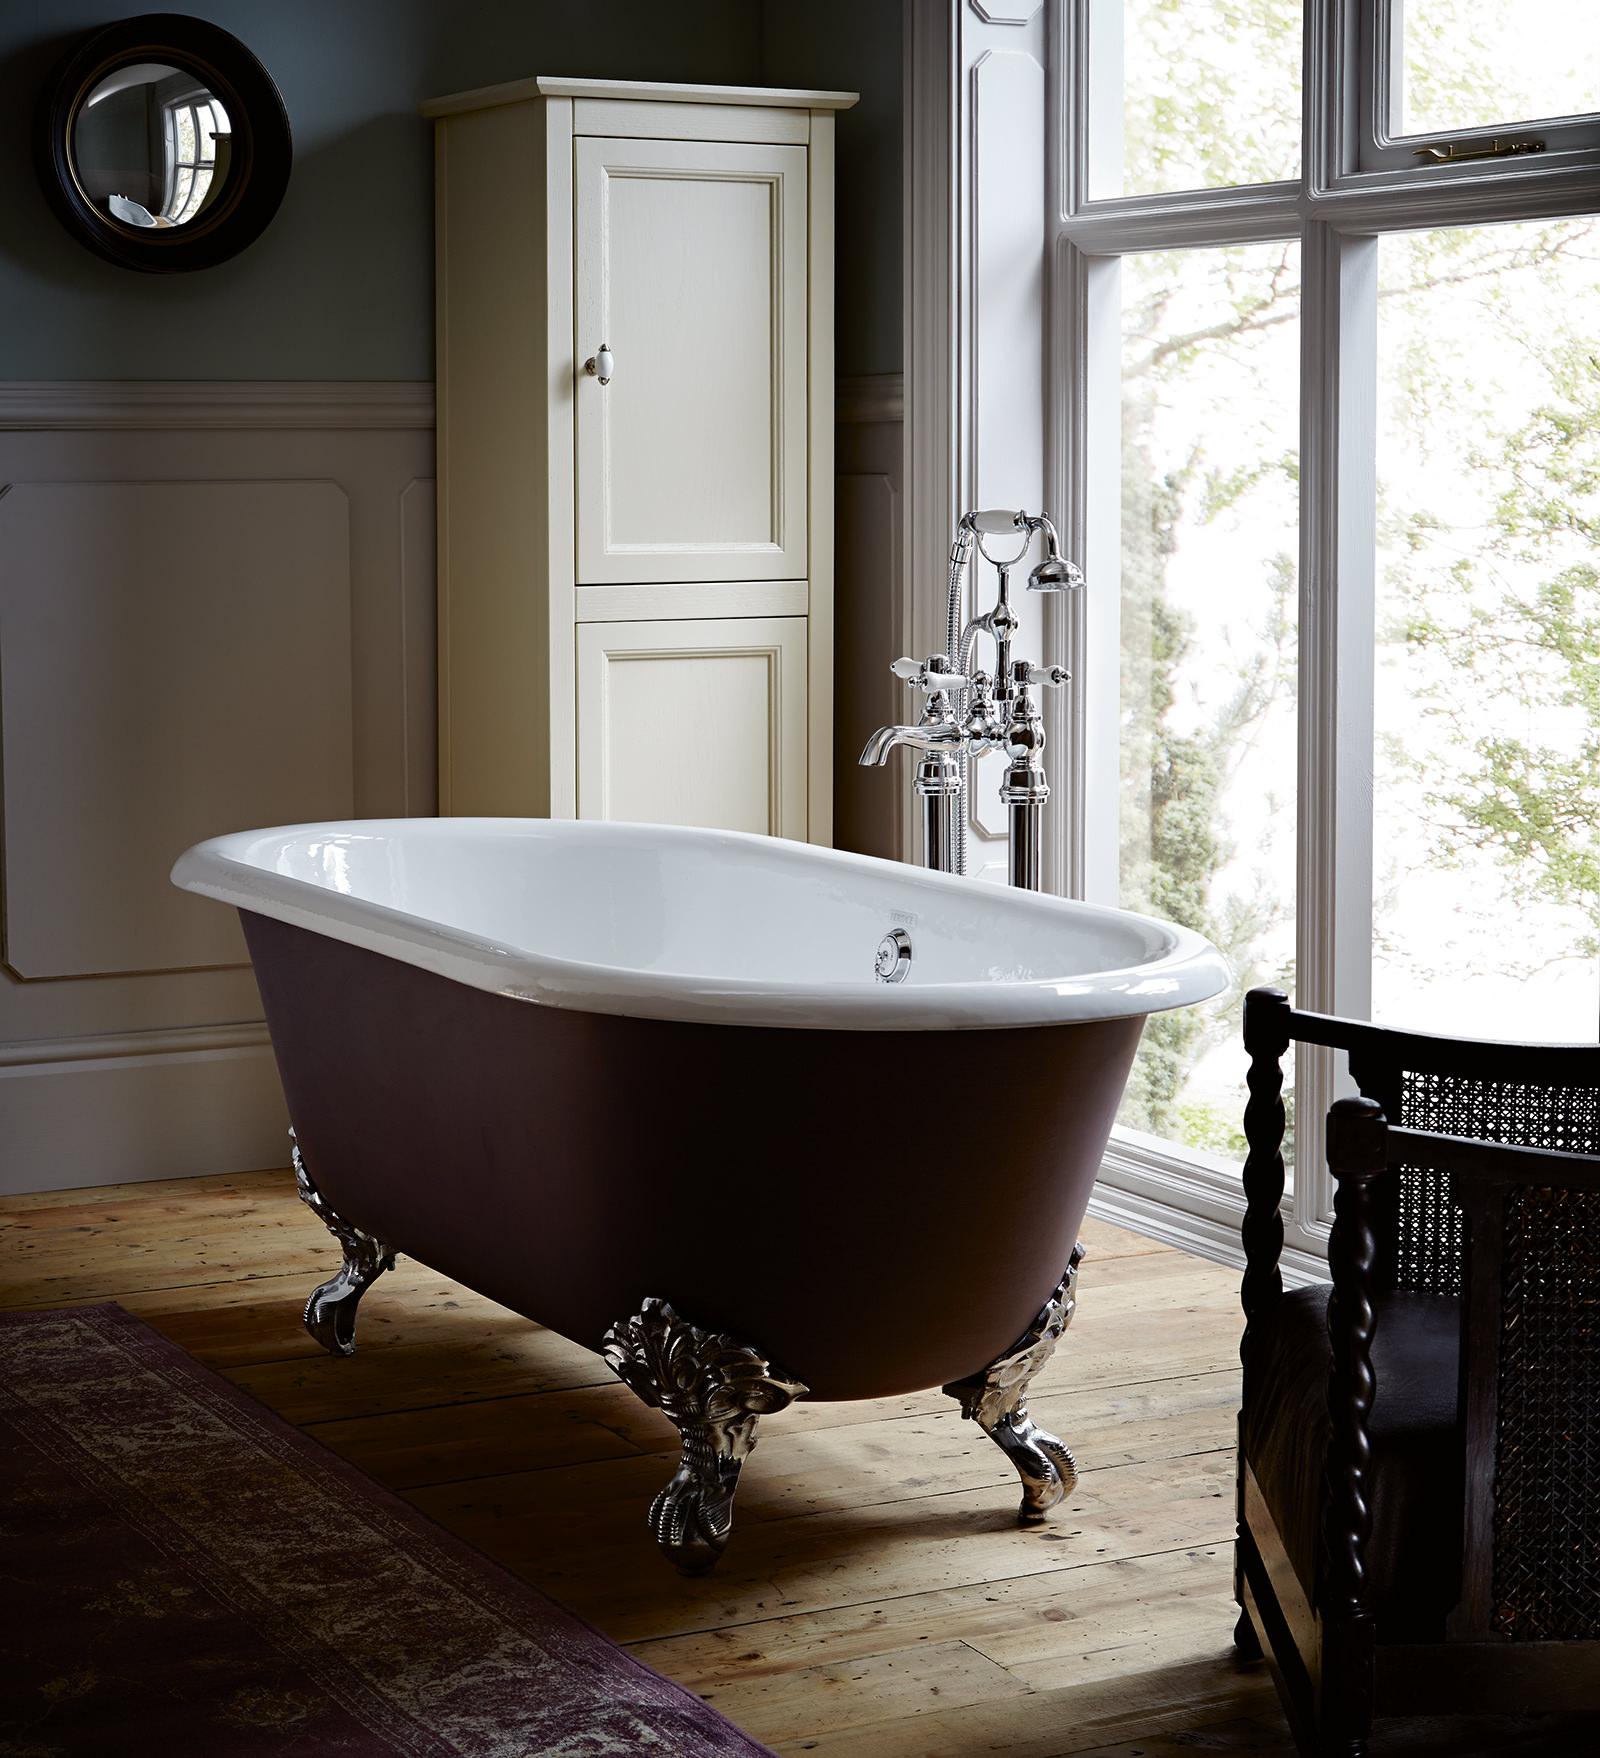 Heritage Baby Buckingham Cast Iron Roll Top Bath With Feet